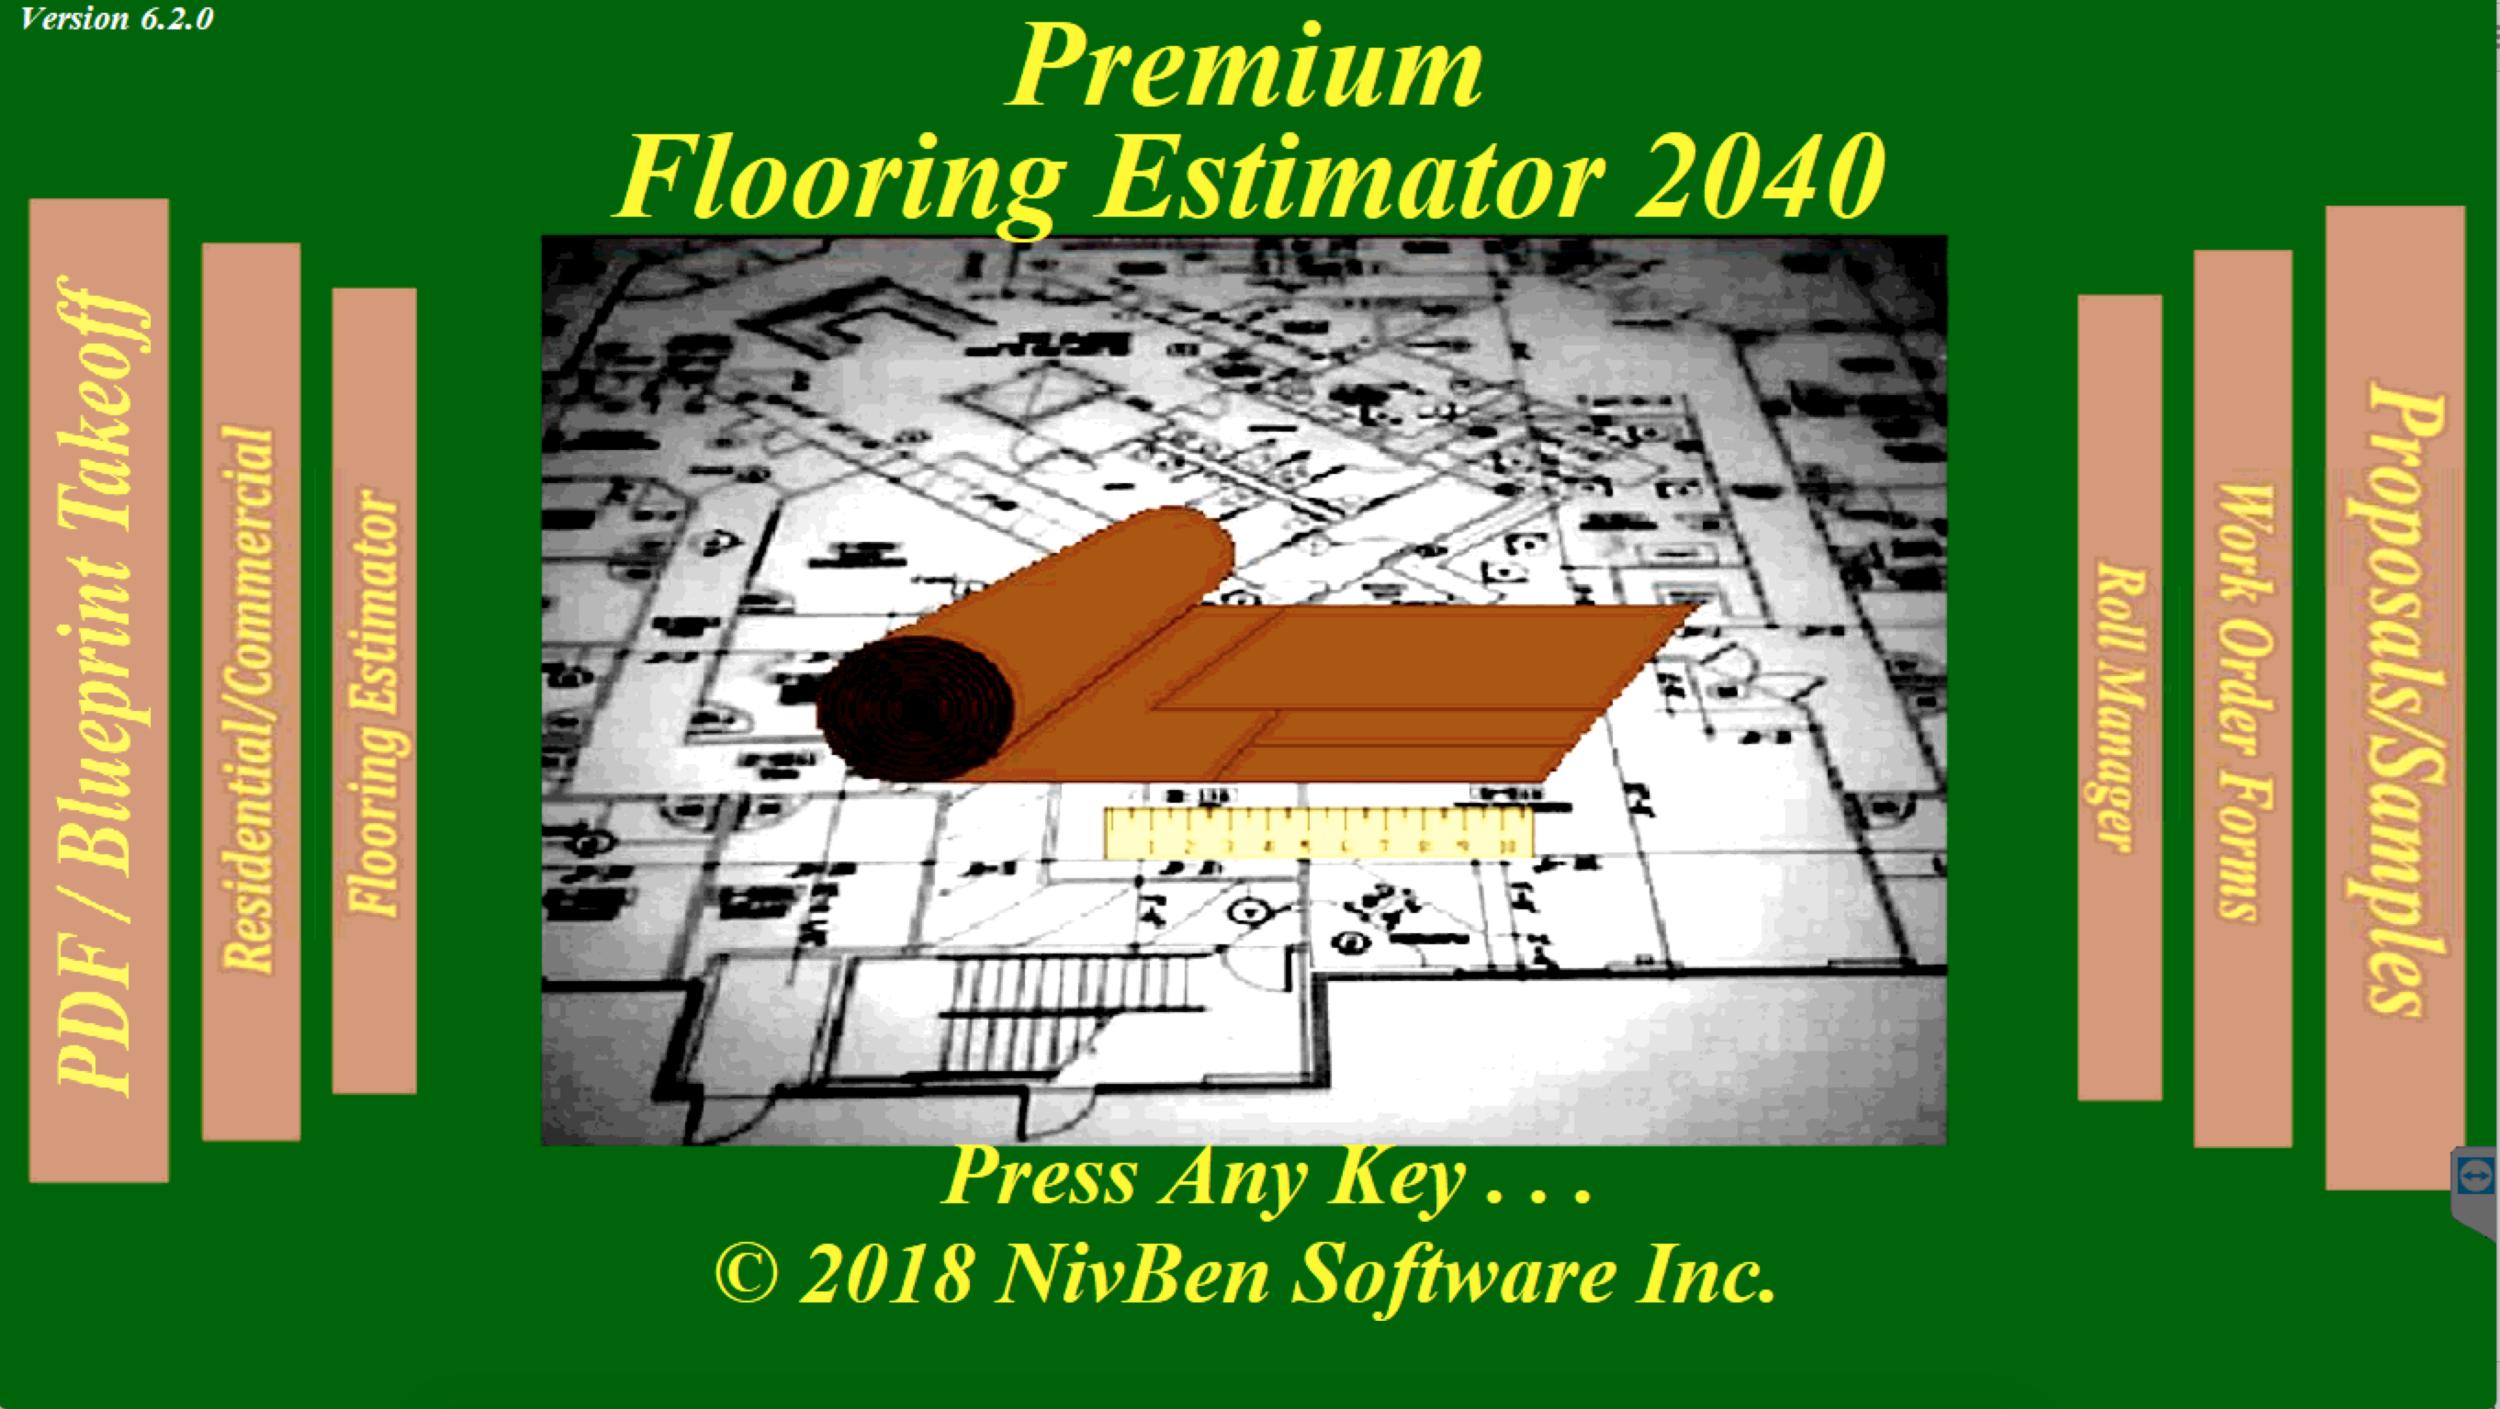 1 year license premium flooring estimator 2040 1 year license malvernweather Images